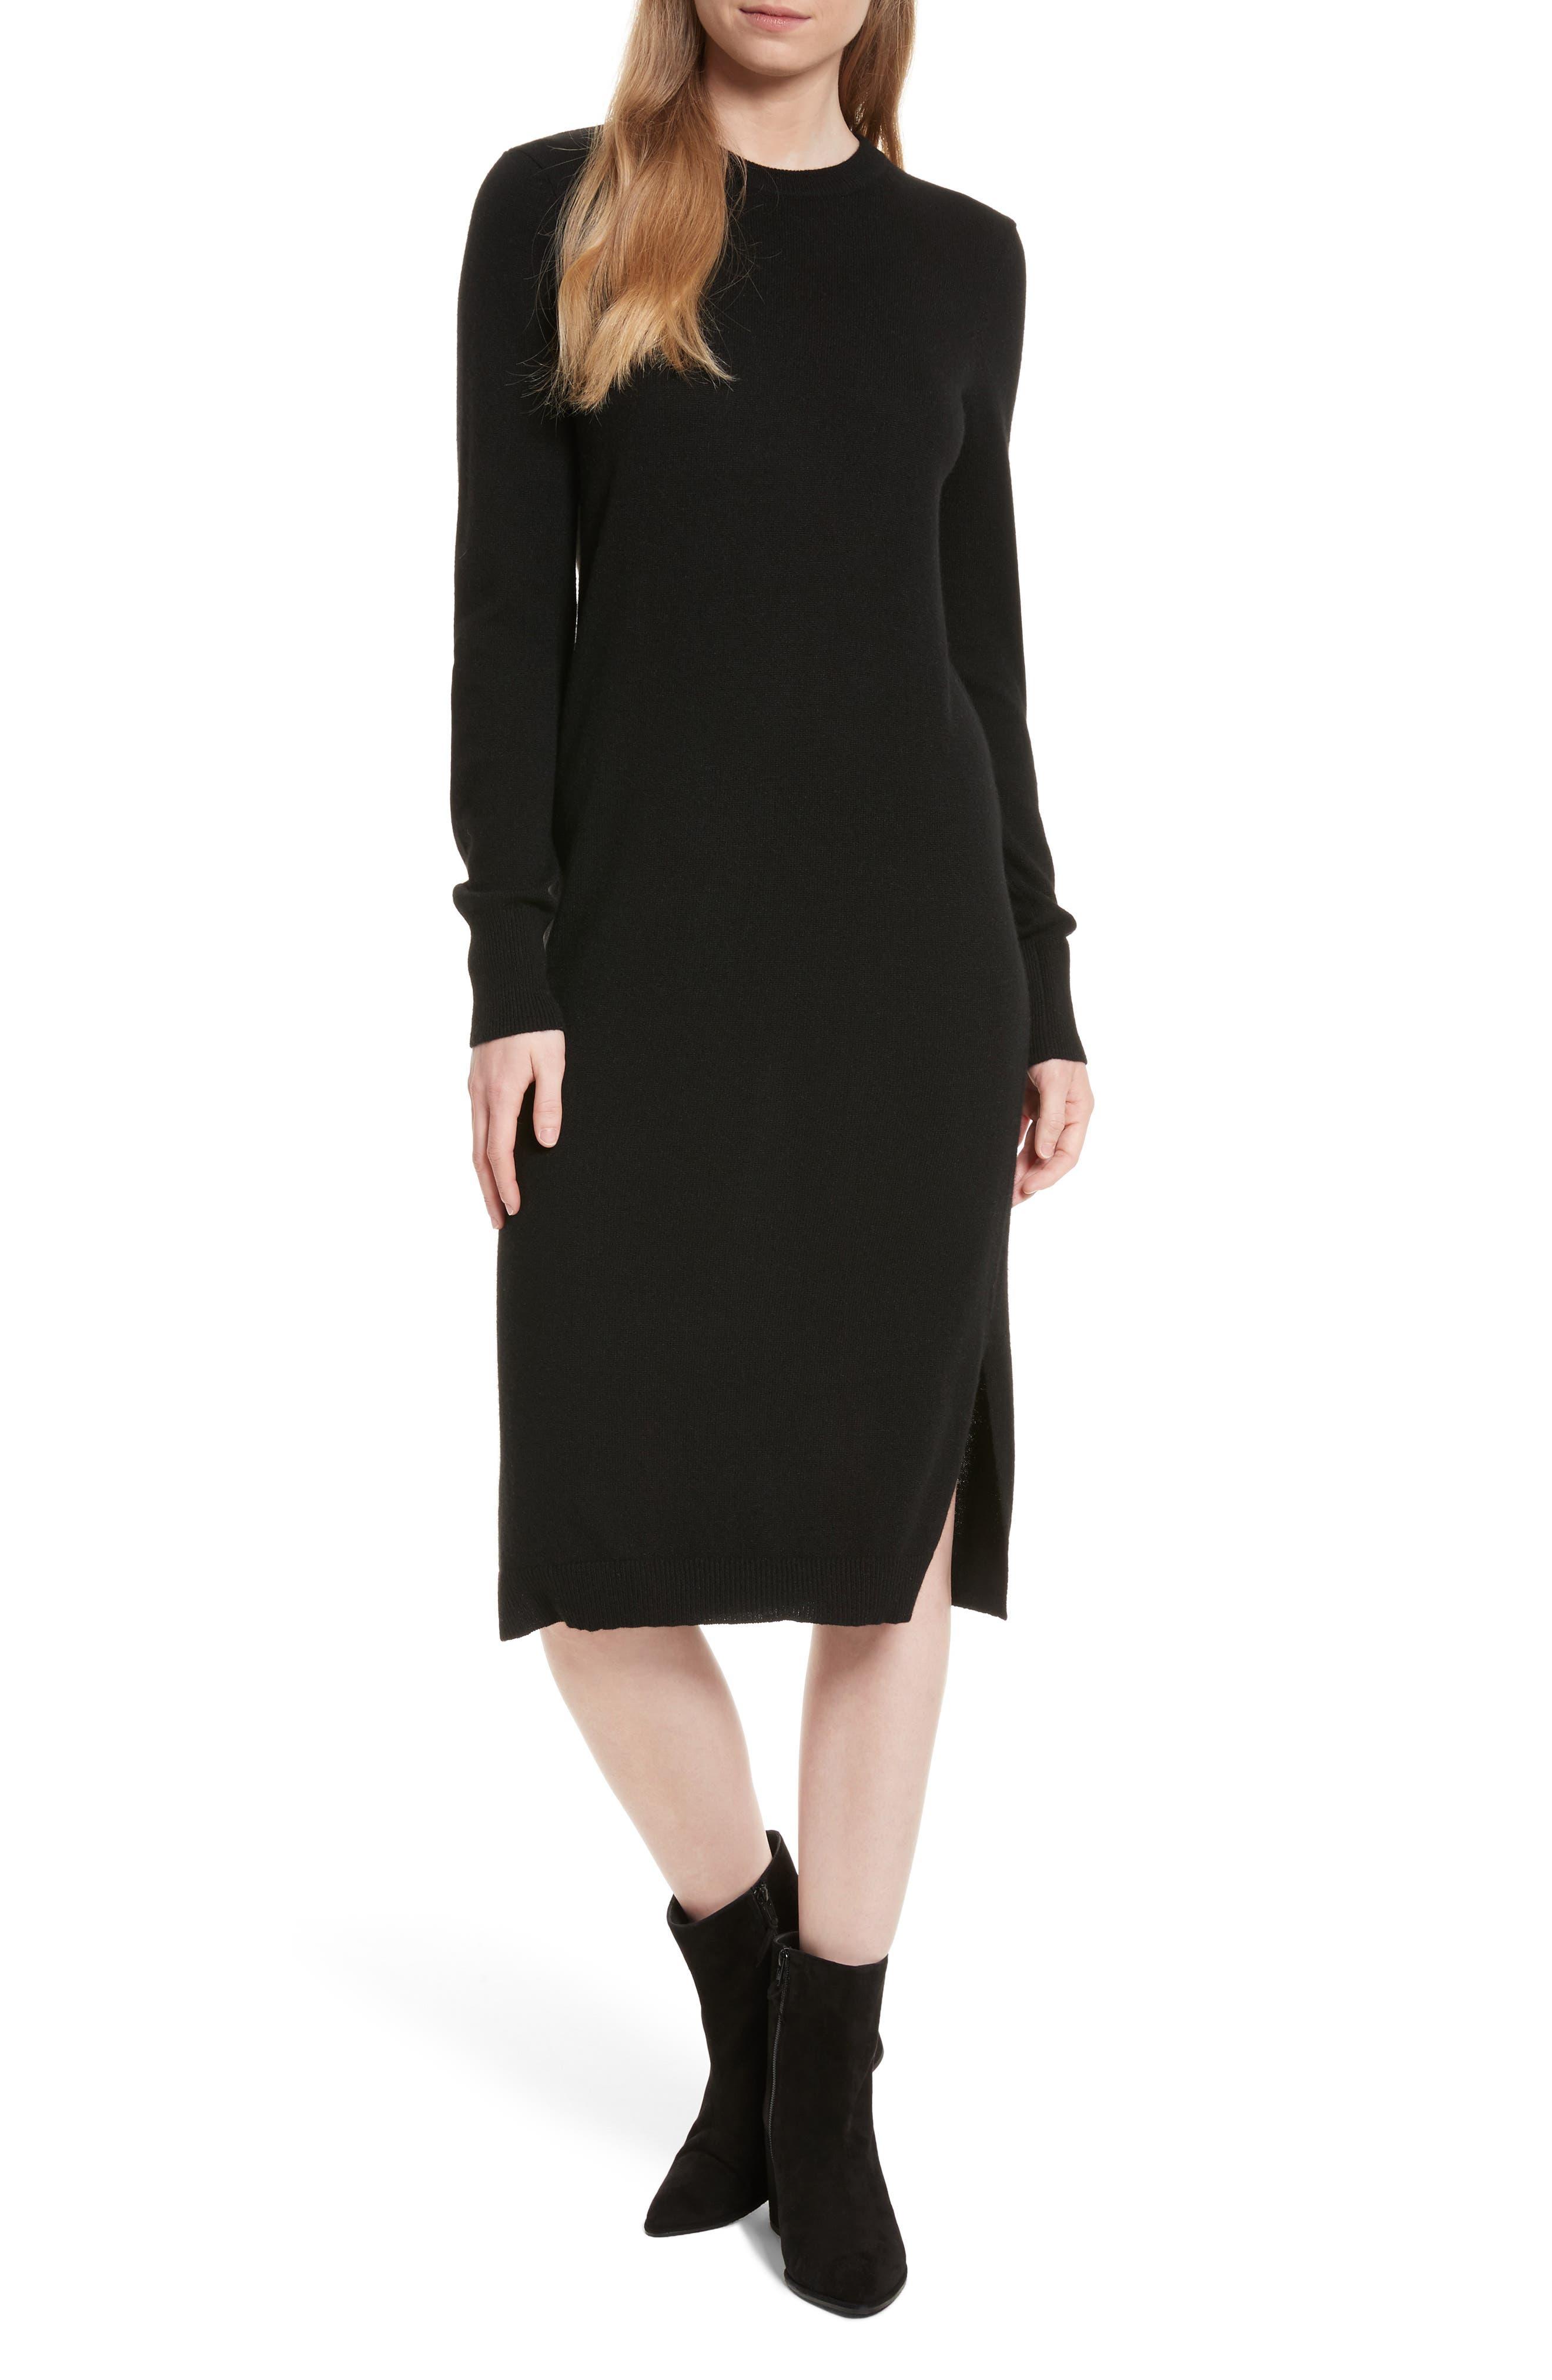 Snyder Cashmere Knit Midi Dress,                         Main,                         color, 001